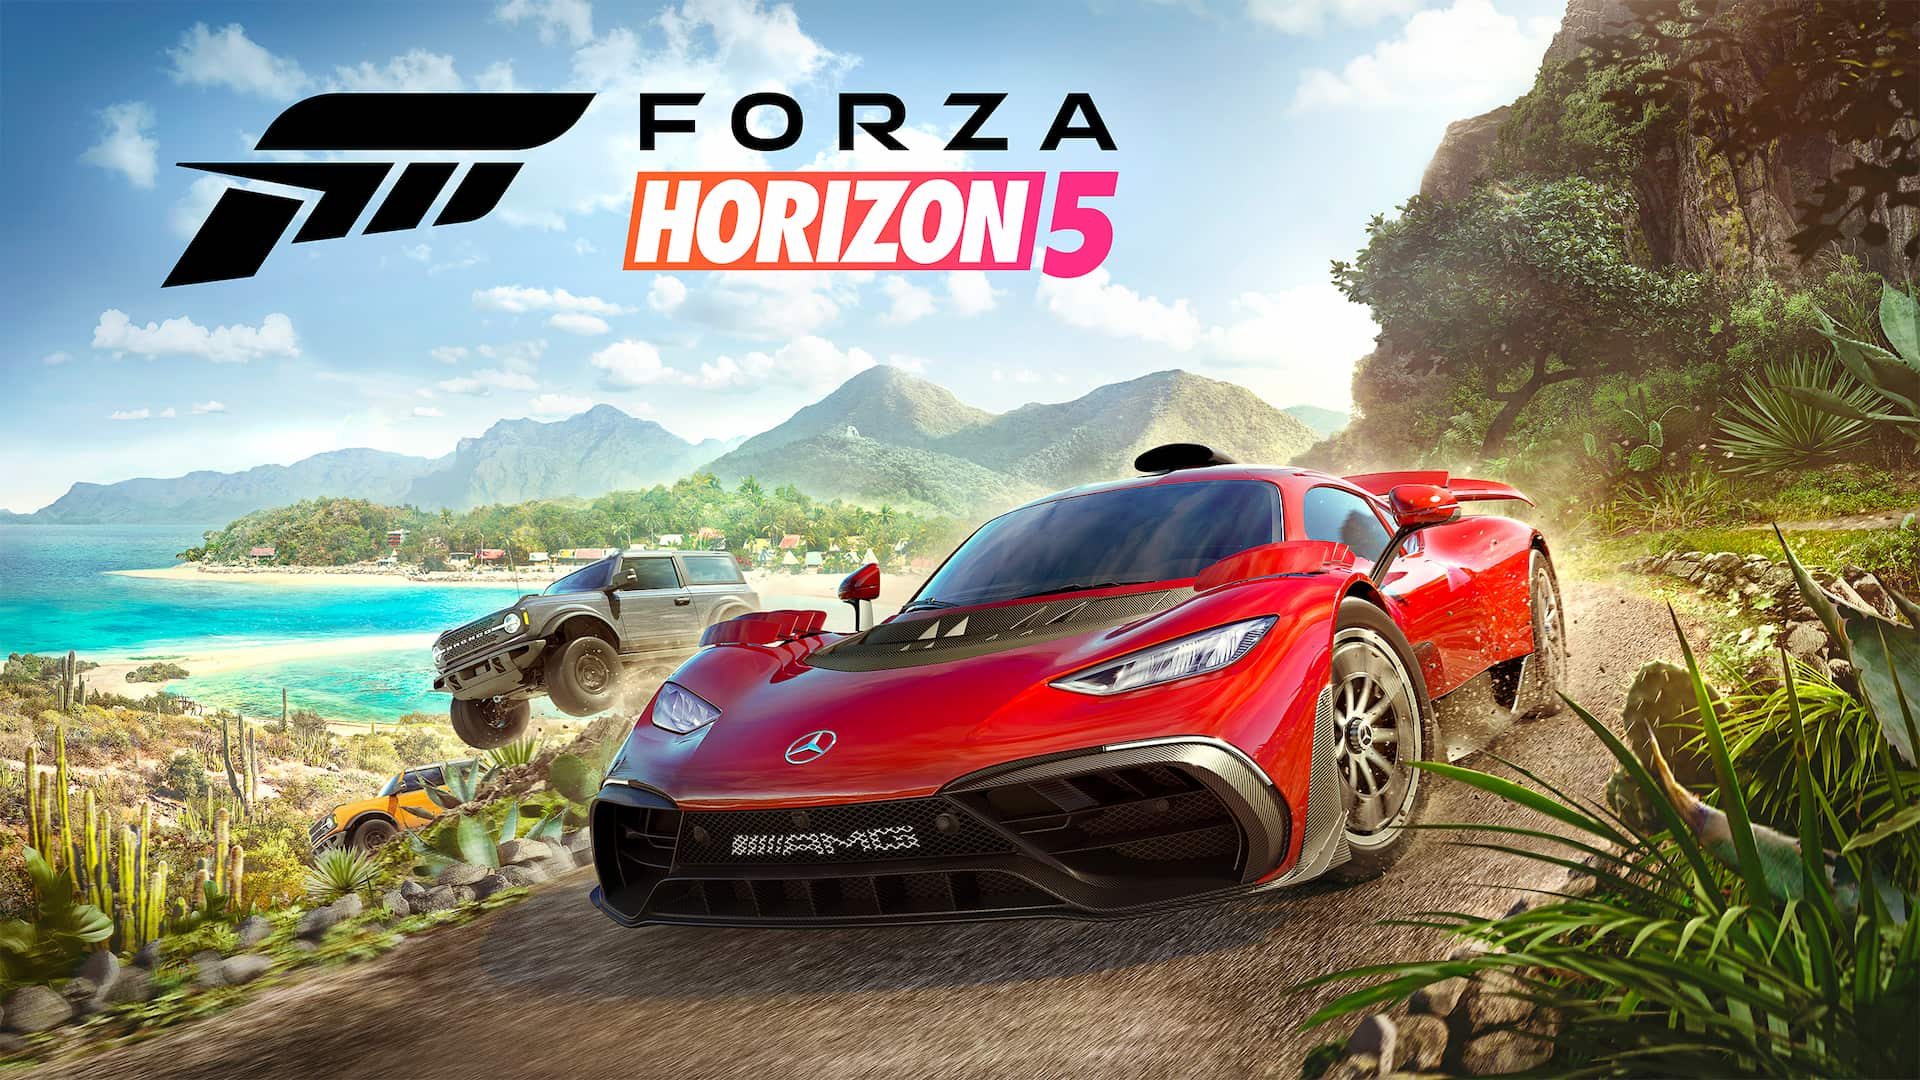 modos multijugador que Forza Horizon 5